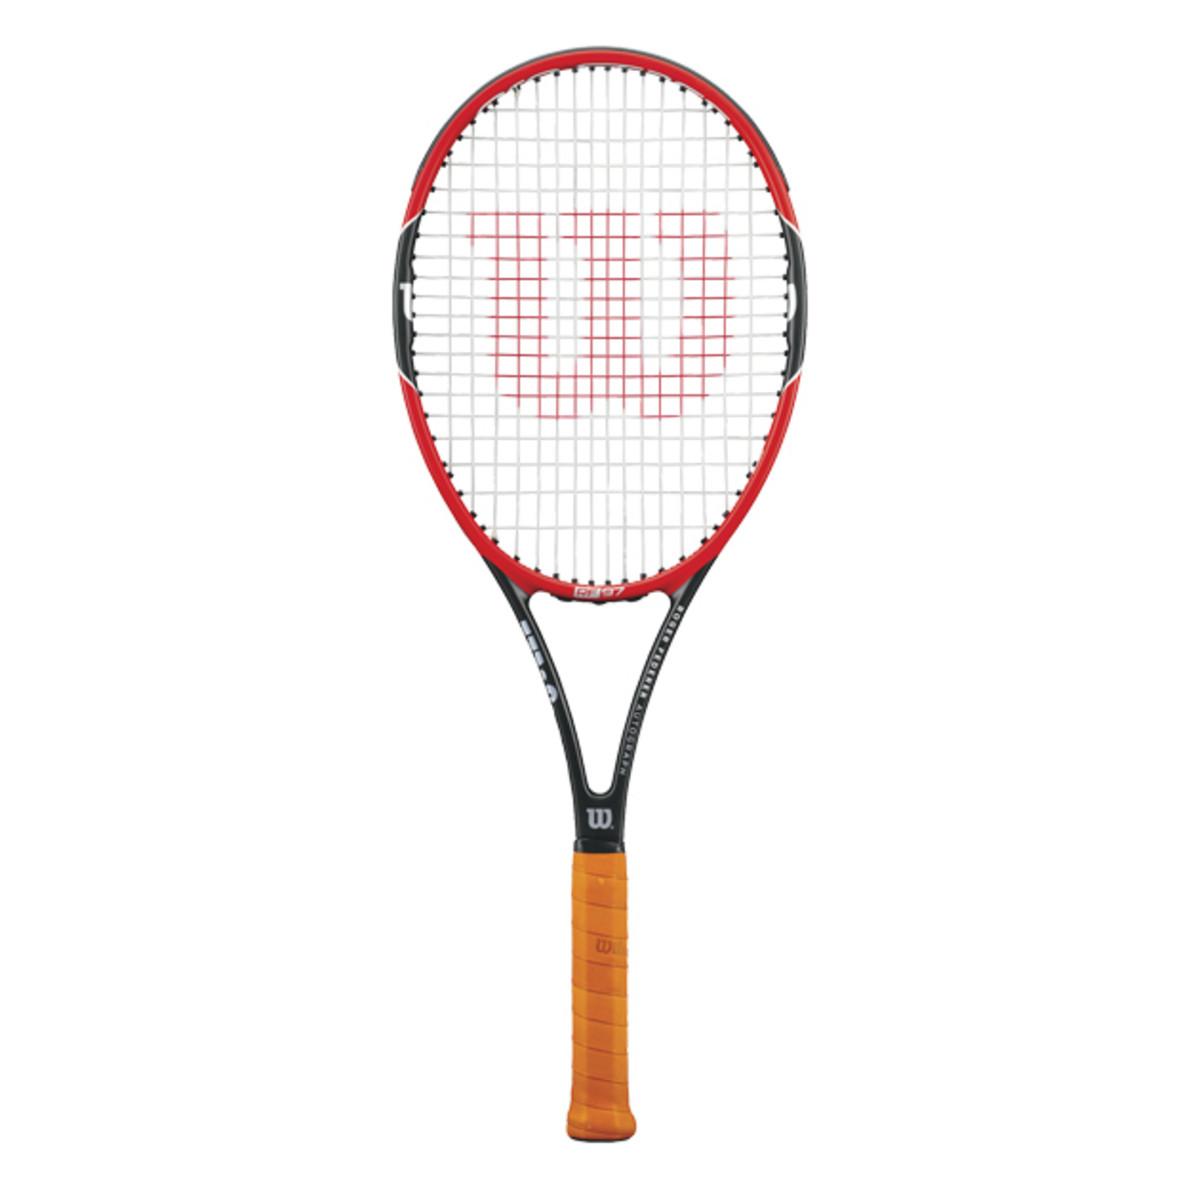 roger-federer-racket-picture.jpg